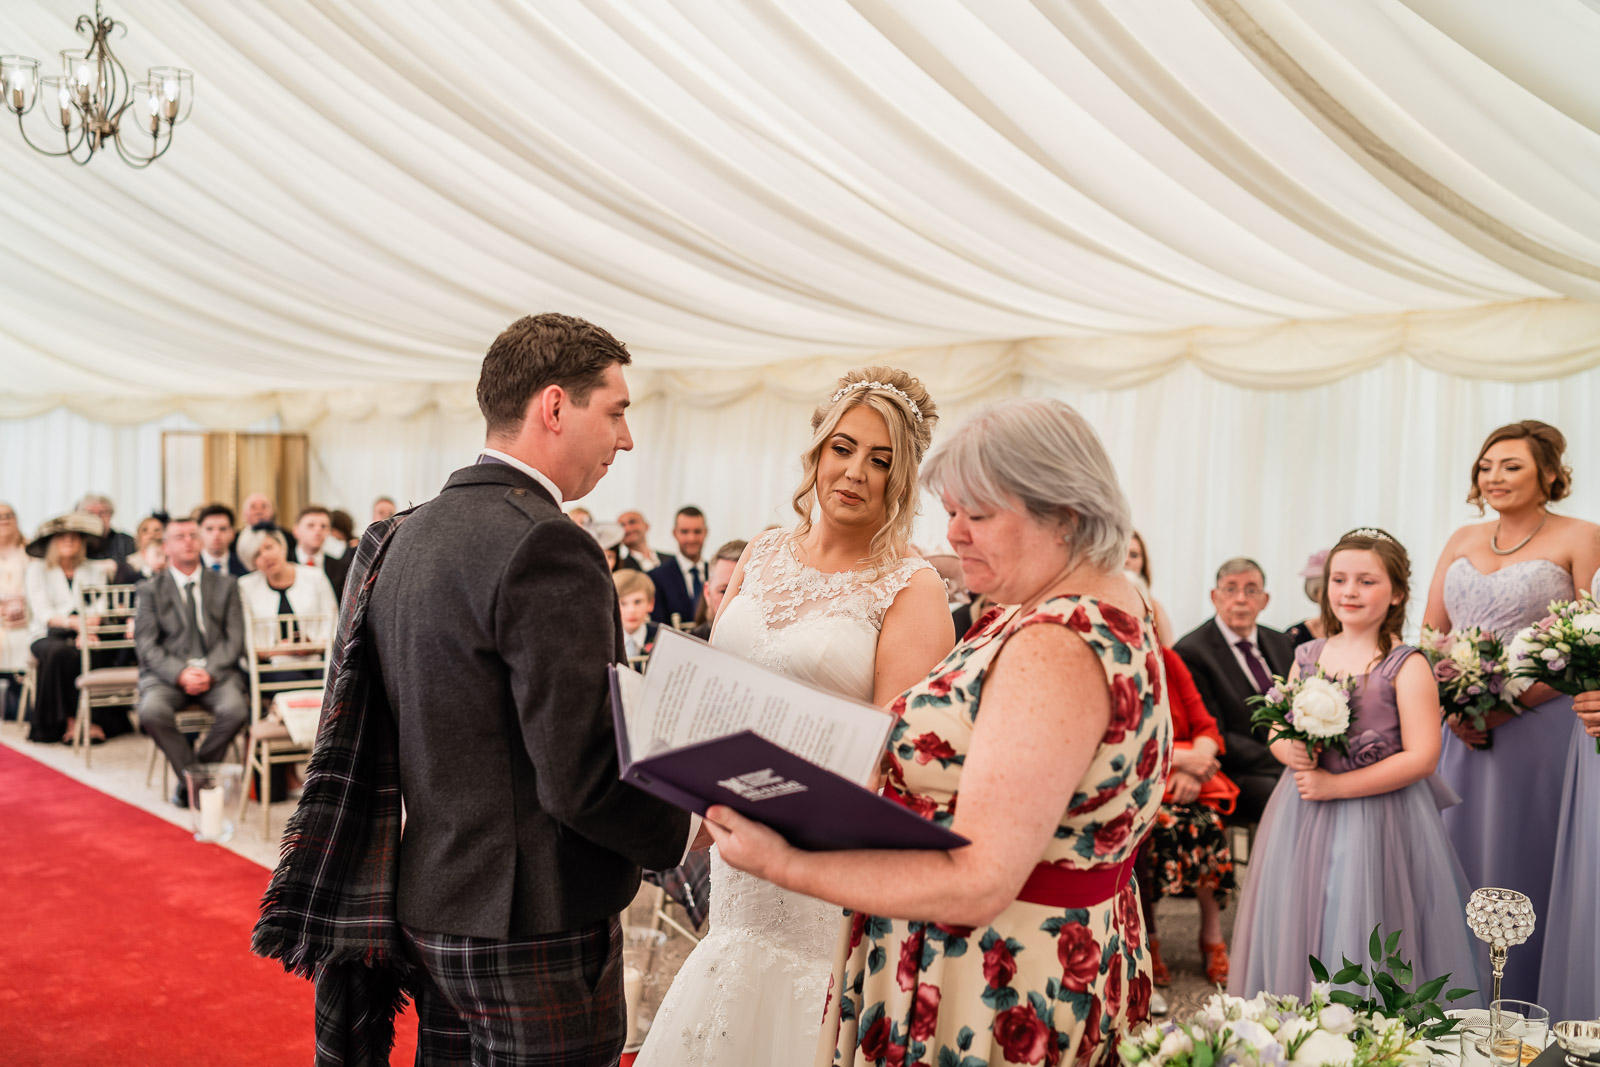 cornhill_castle_wedding_biggar_dearlyphotography (104 of 448).jpg